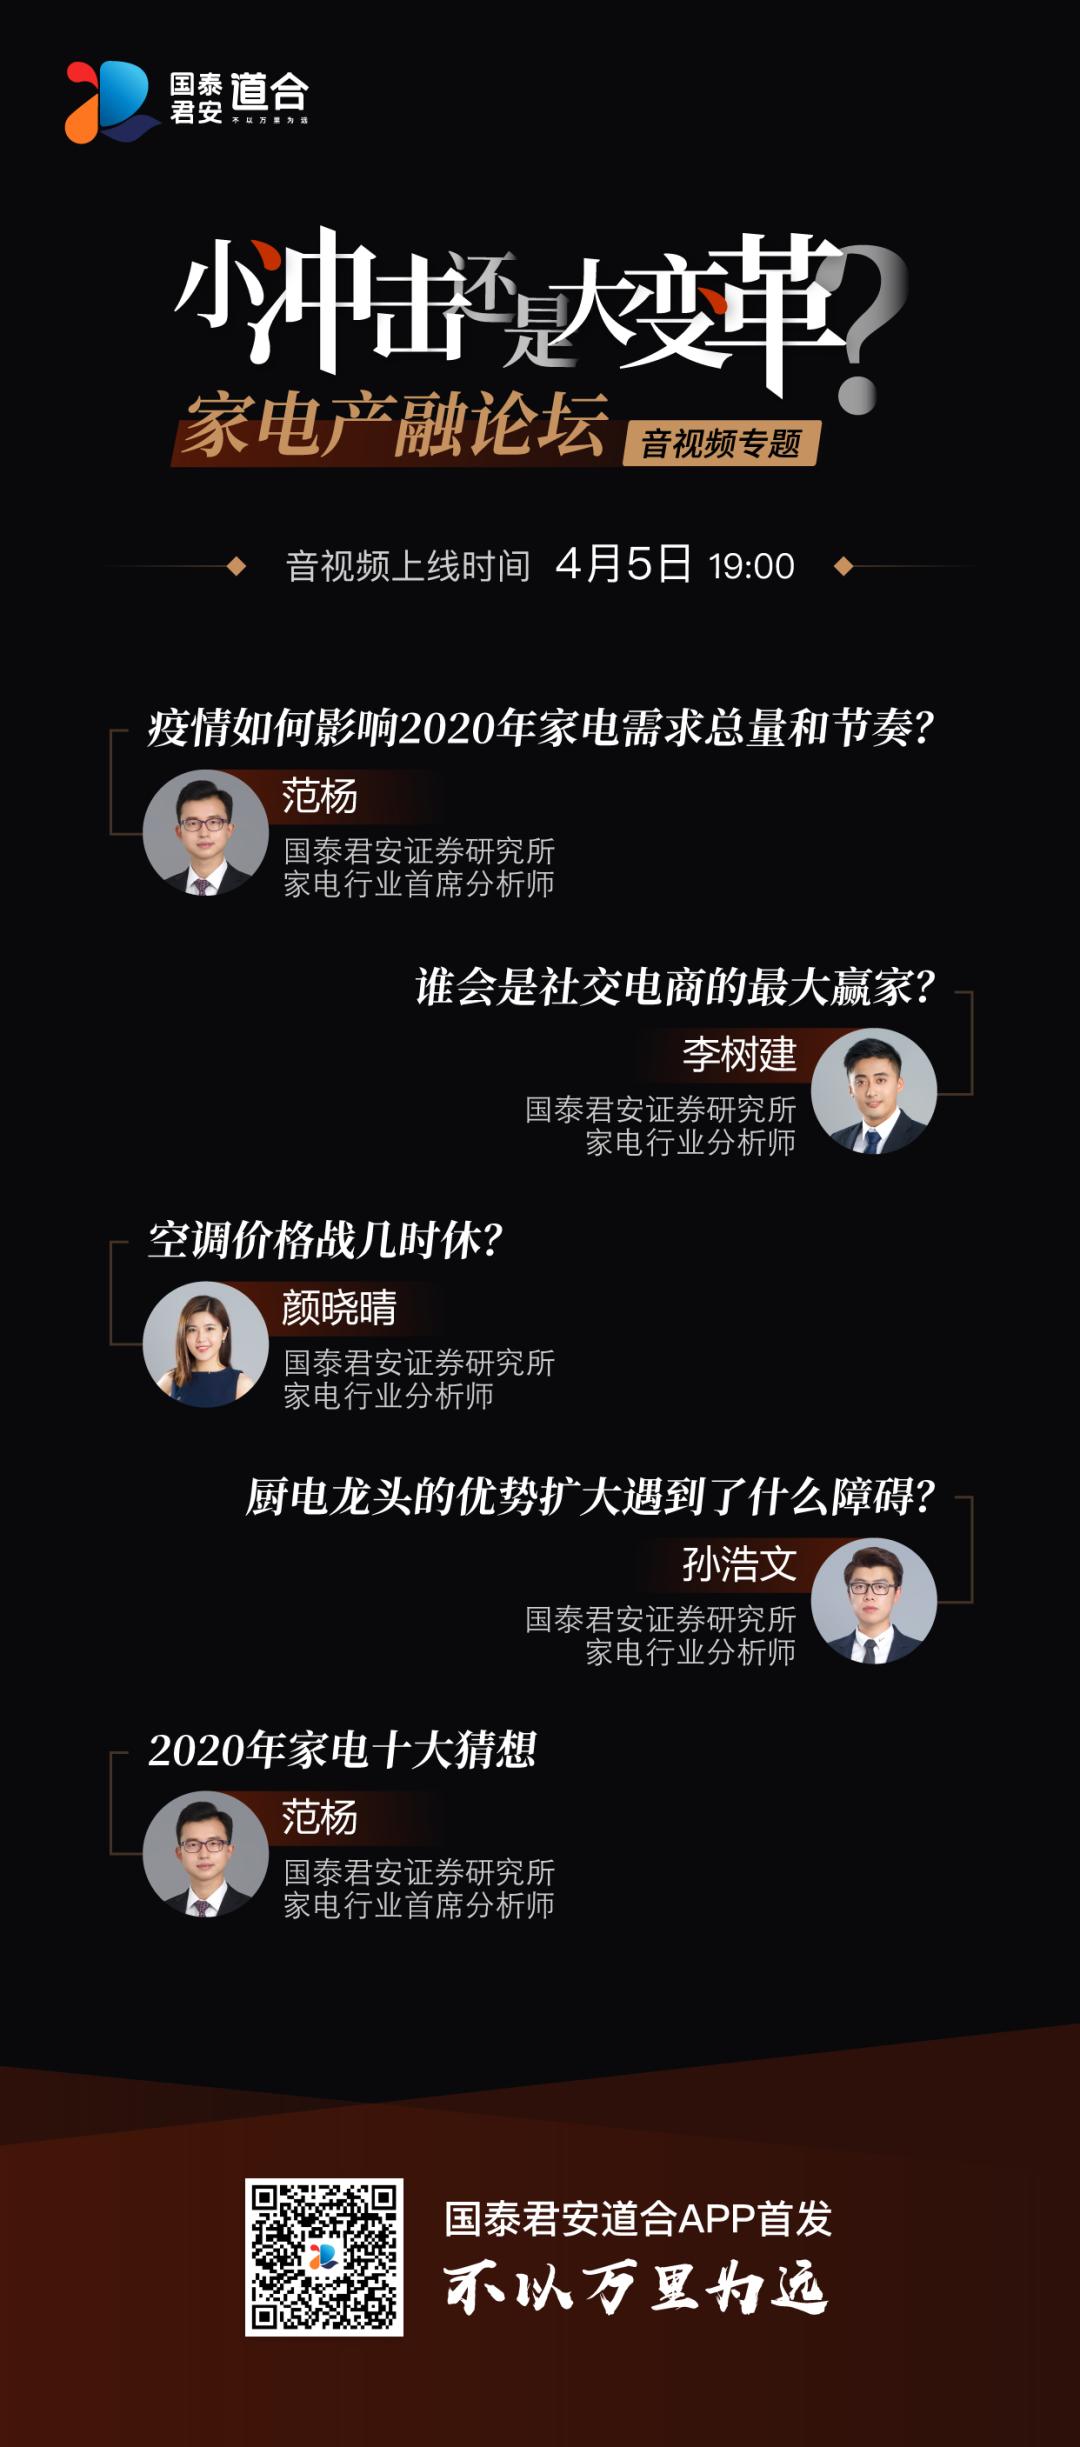 http://www.shangoudaohang.com/anli/310455.html